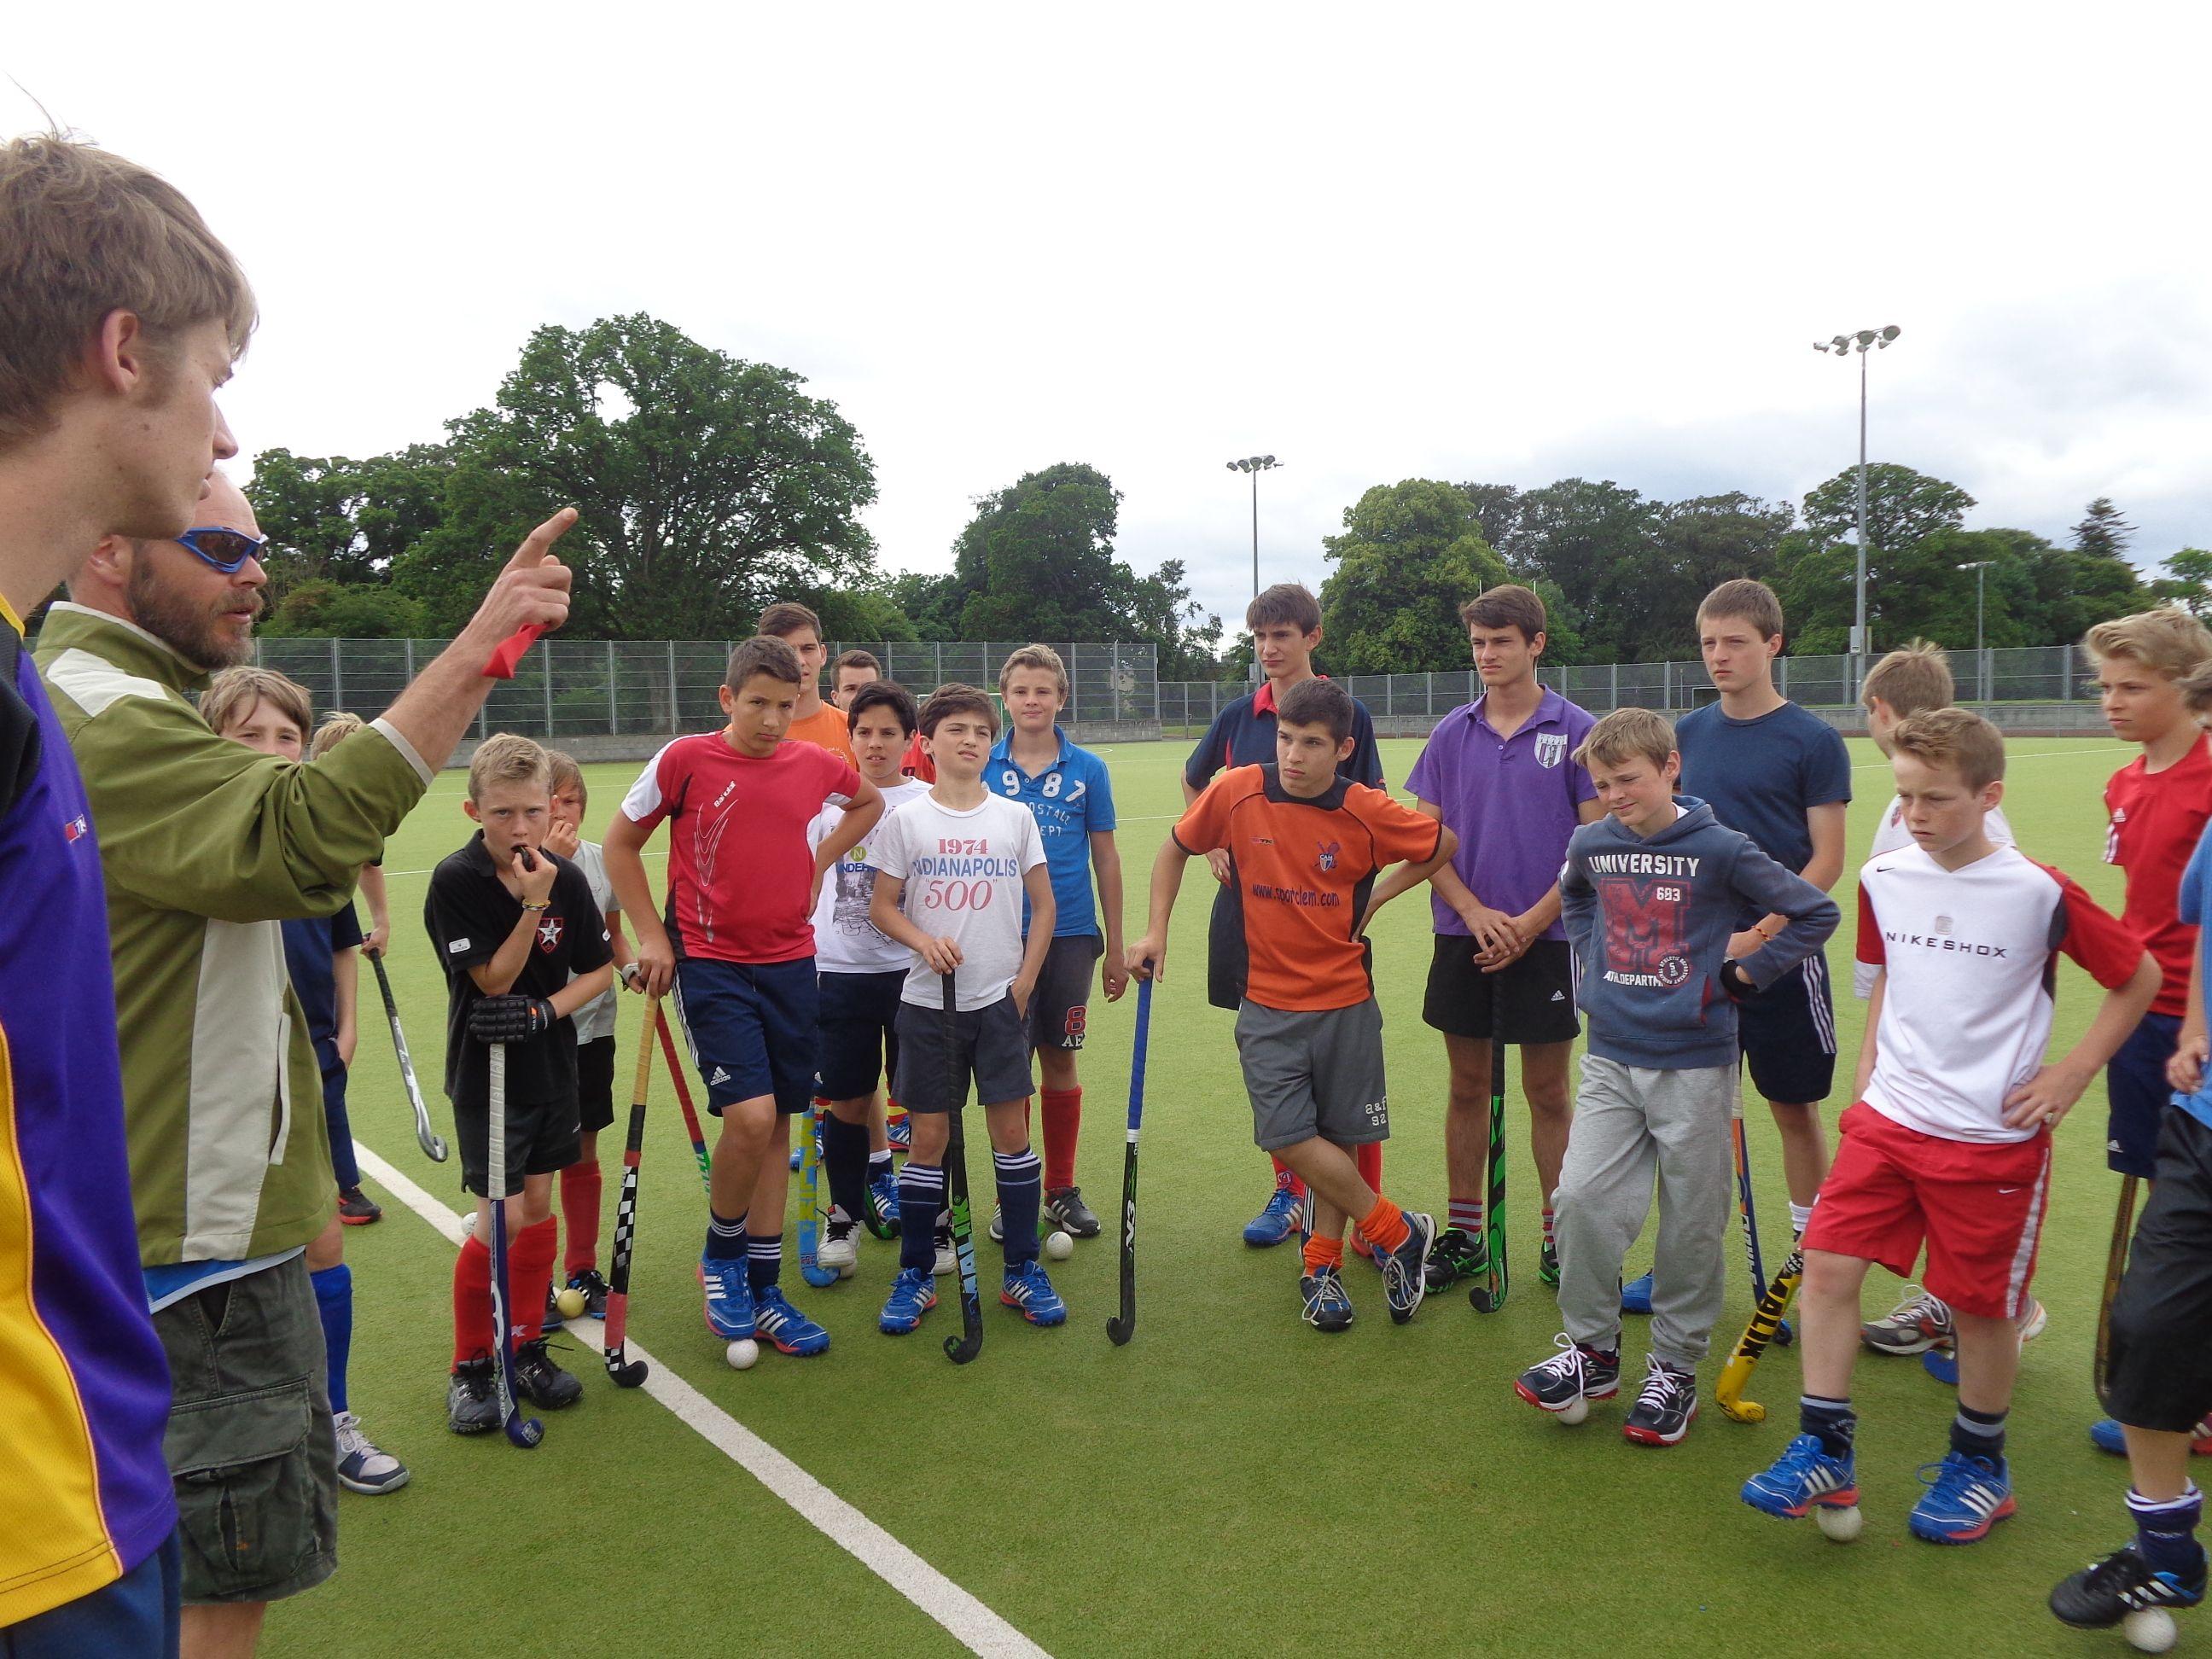 S jour hockey anglais sports et vacances for Voyage organise jardins anglais